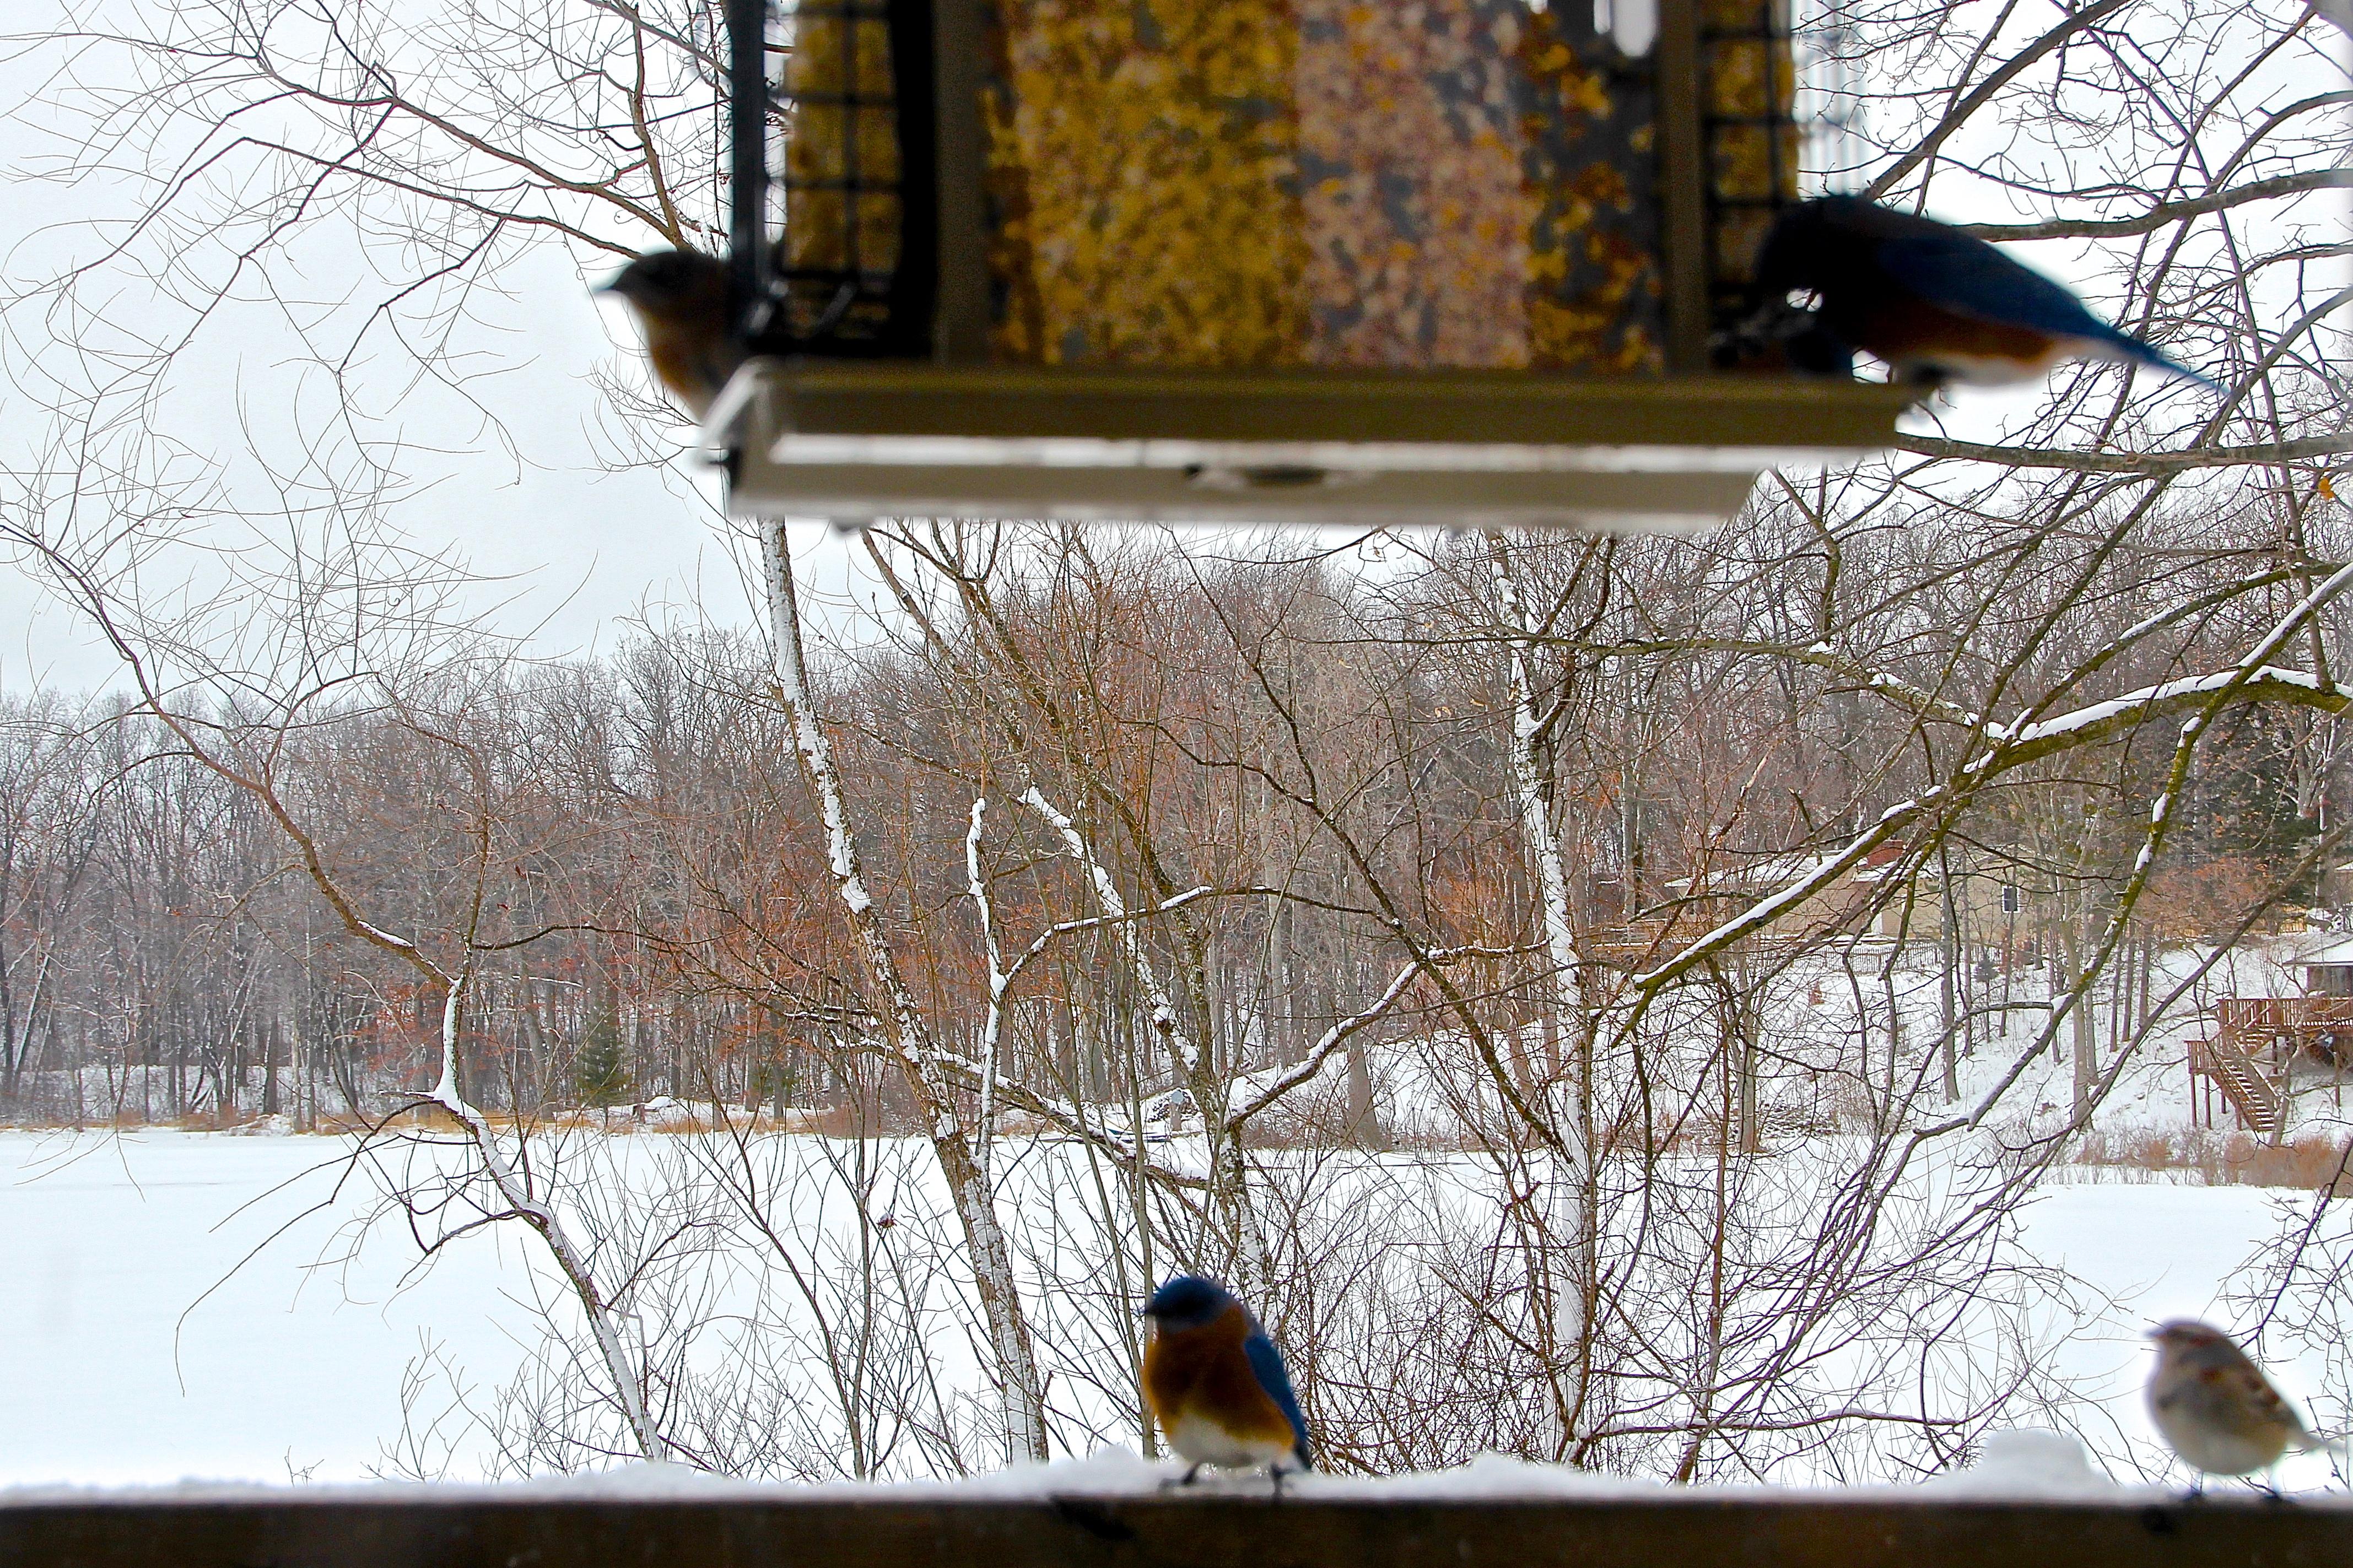 Bluebirds waiting their turn at feeder